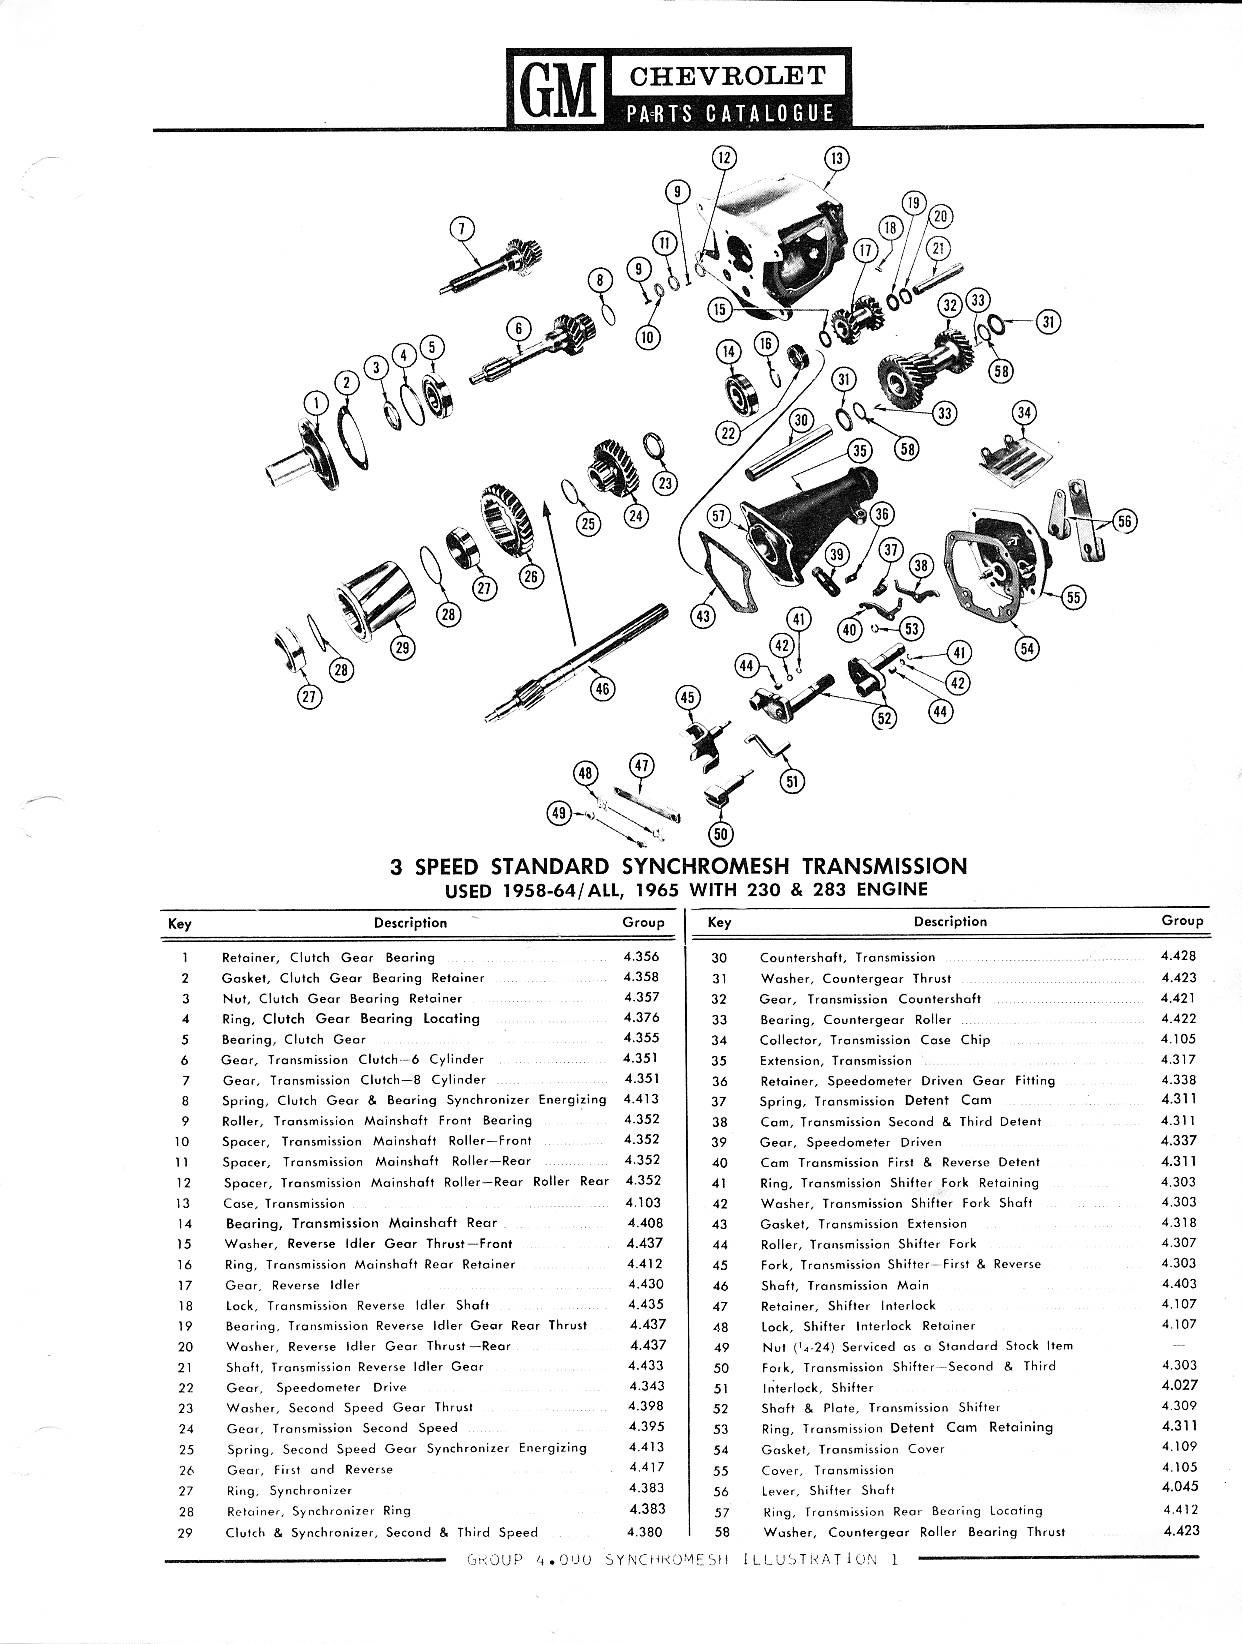 1958-1968 Chevrolet Parts Catalog / Image59.jpg